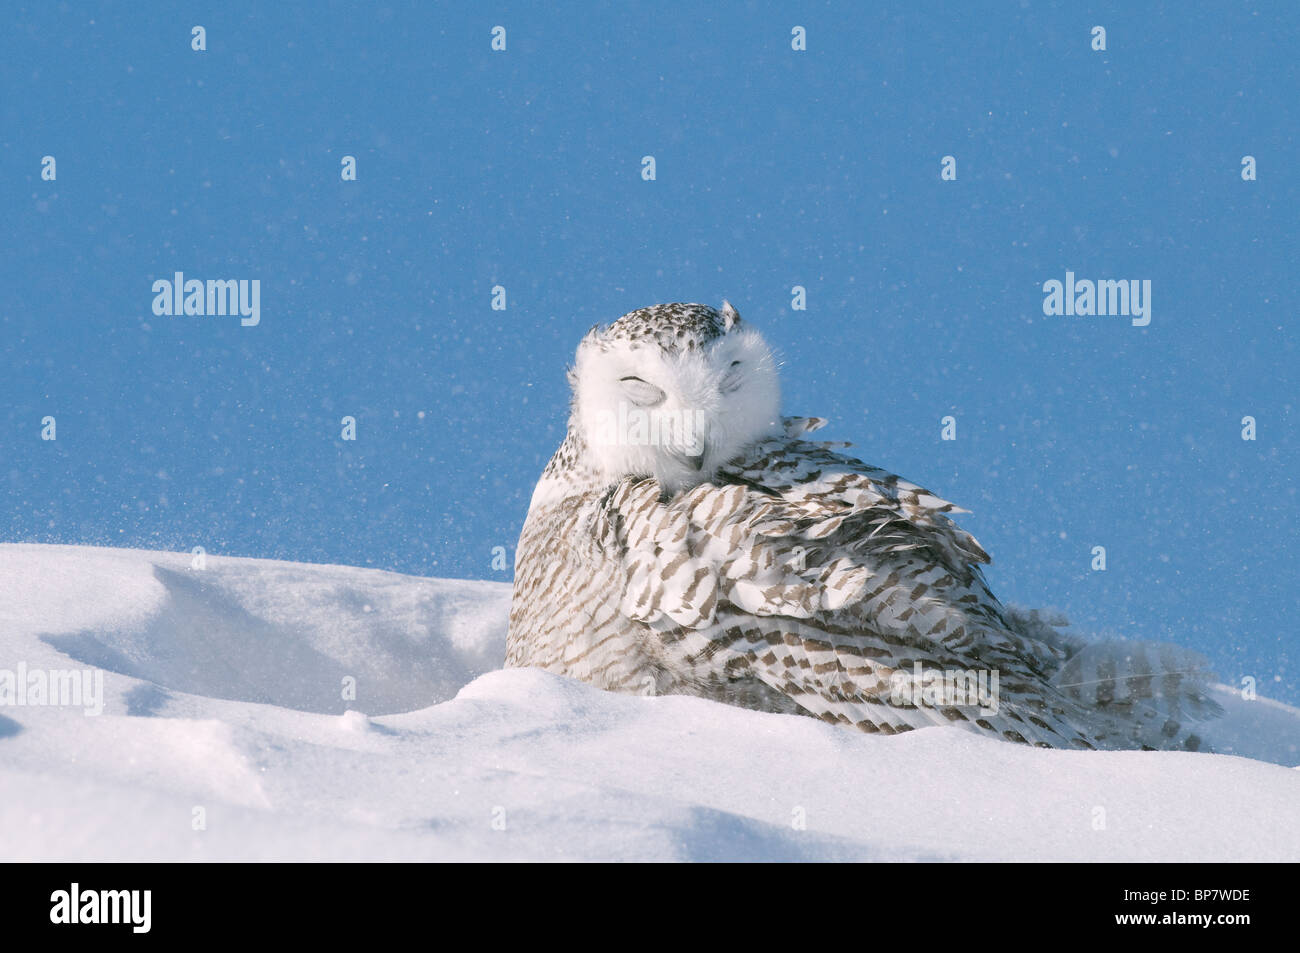 Schnee-Eule (Bubo Scandiacus, Nyctea Scandiaca) ruhen im Schnee mit Augen geschlossen. Stockbild